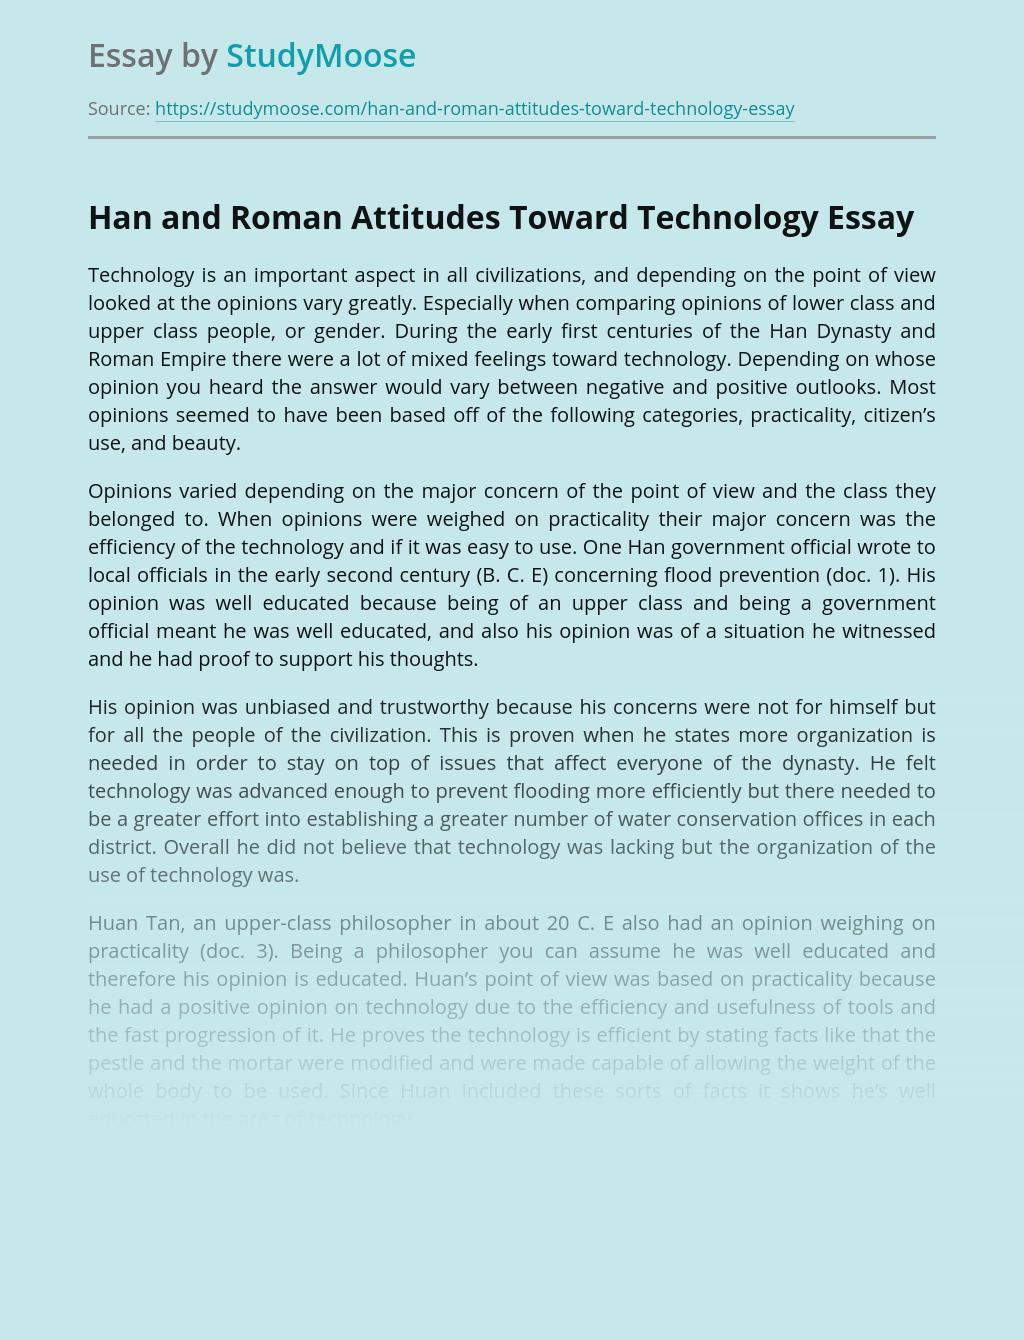 Han and Roman Attitudes Toward Technology